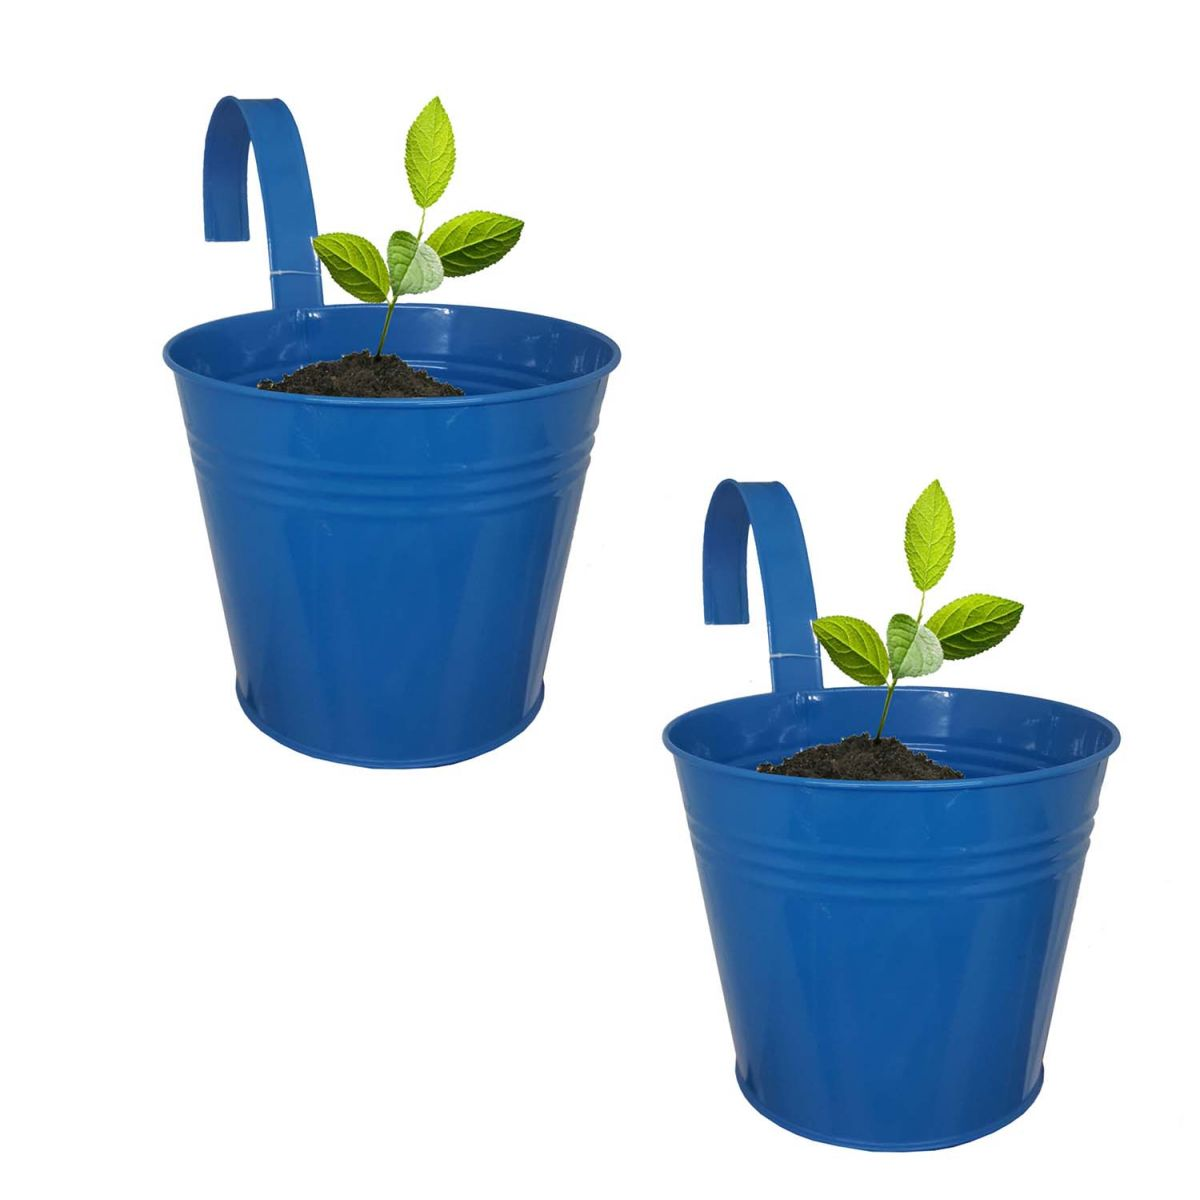 Conjunto Com 2 Cachepot De Metal Para Jardim Suspenso Vertical Grande Azul (cachepo-3 grande)